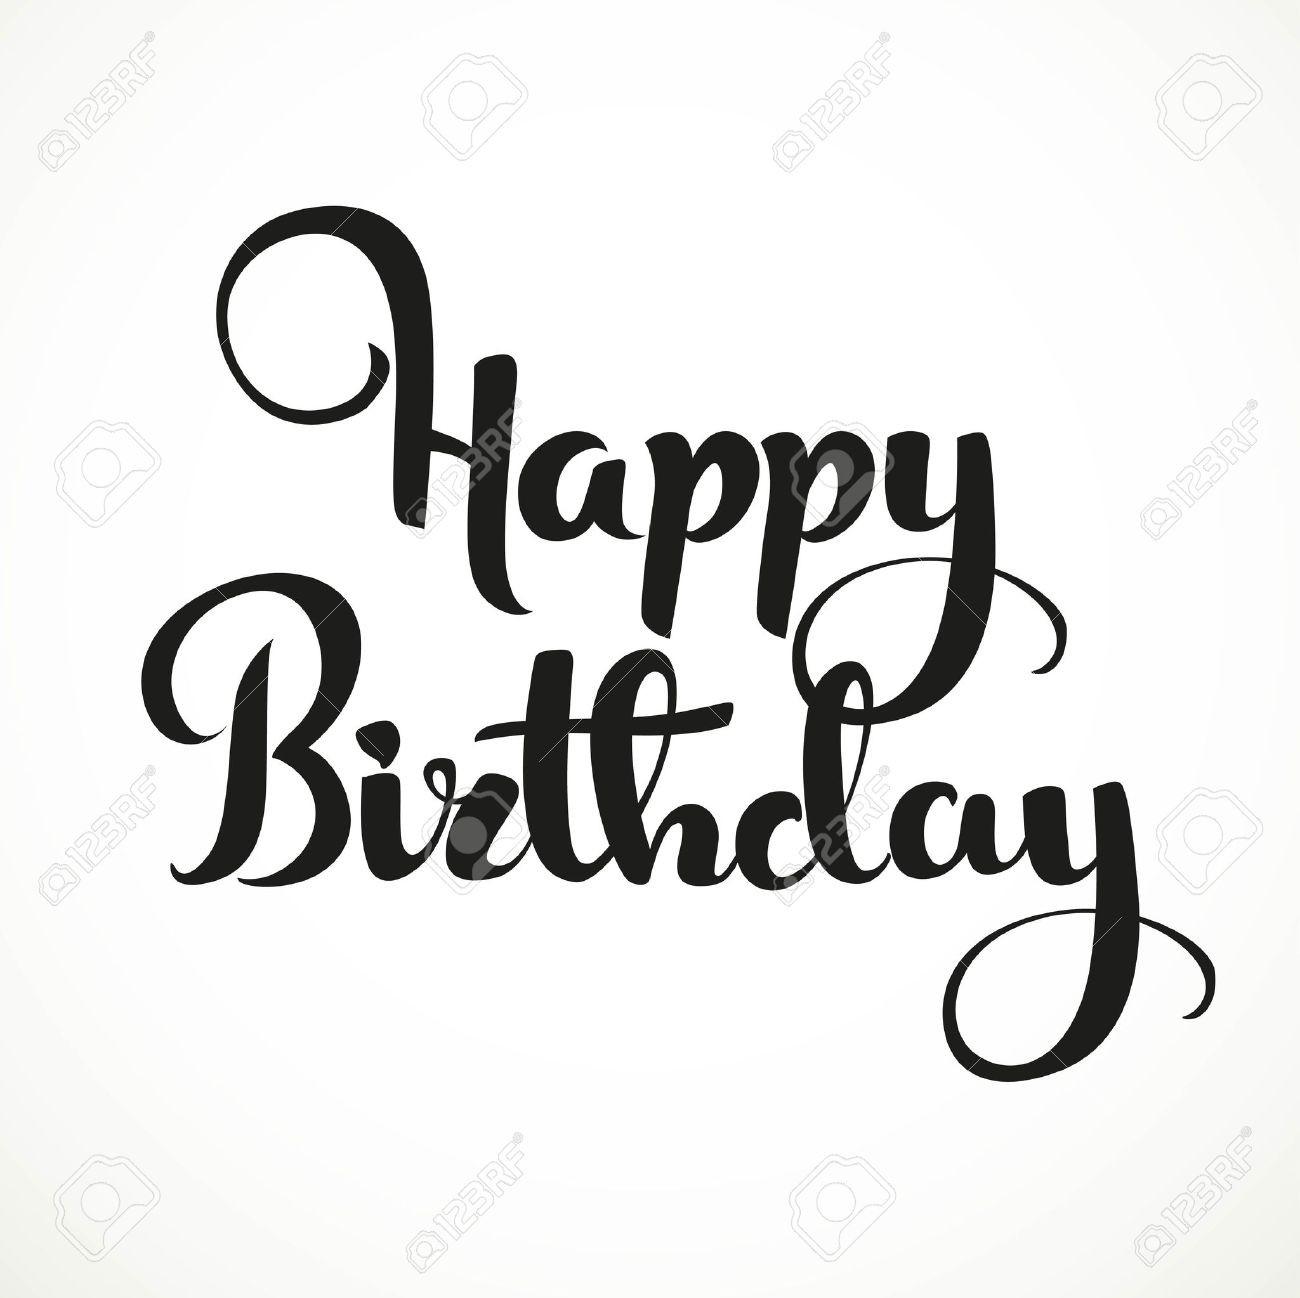 Happy Birthday Drawing Text